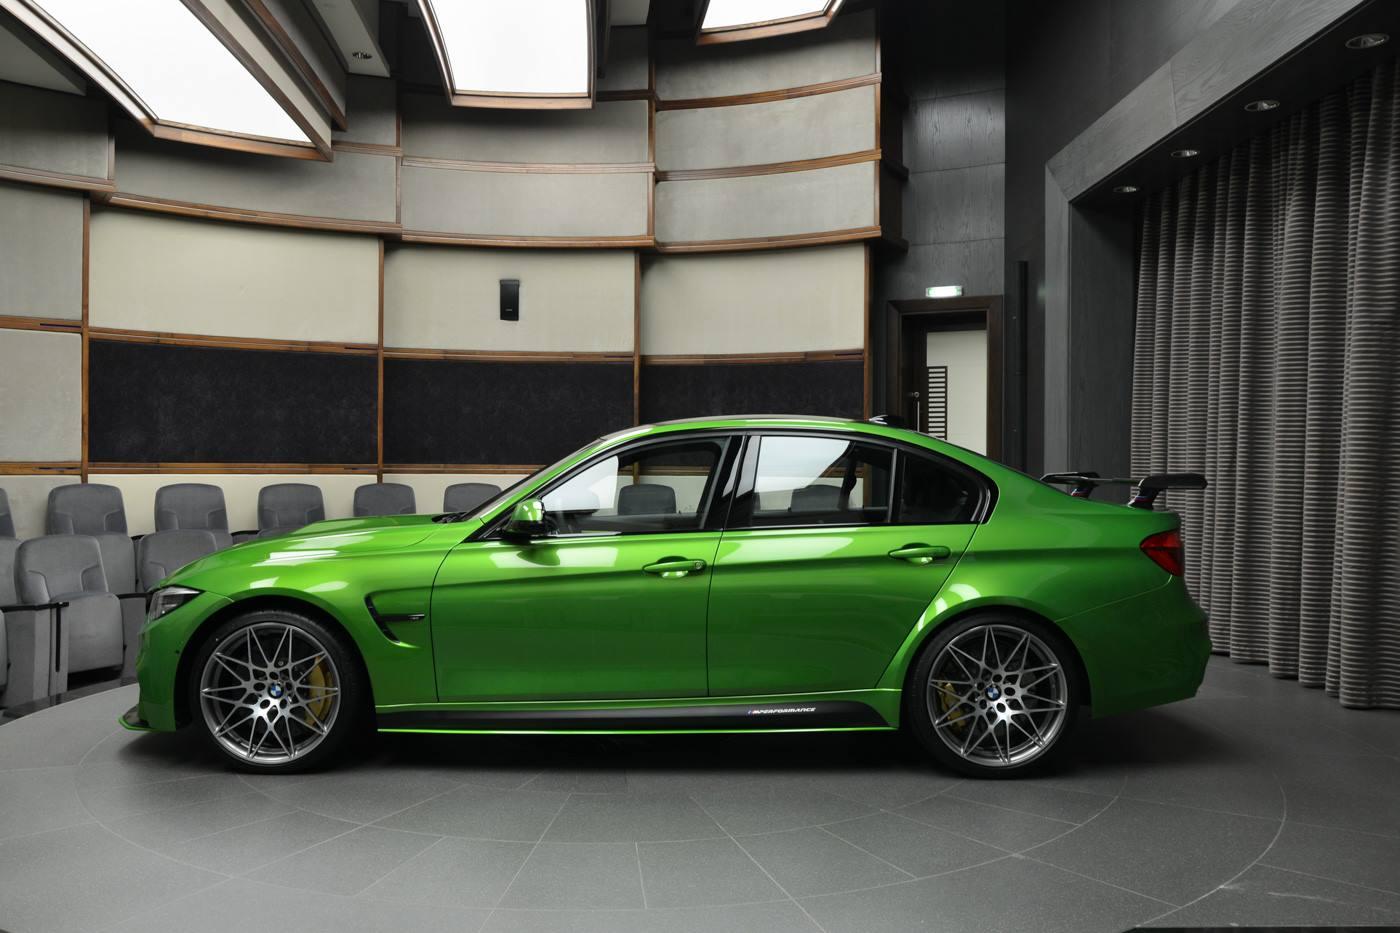 BMW_M3_Java_Green_01